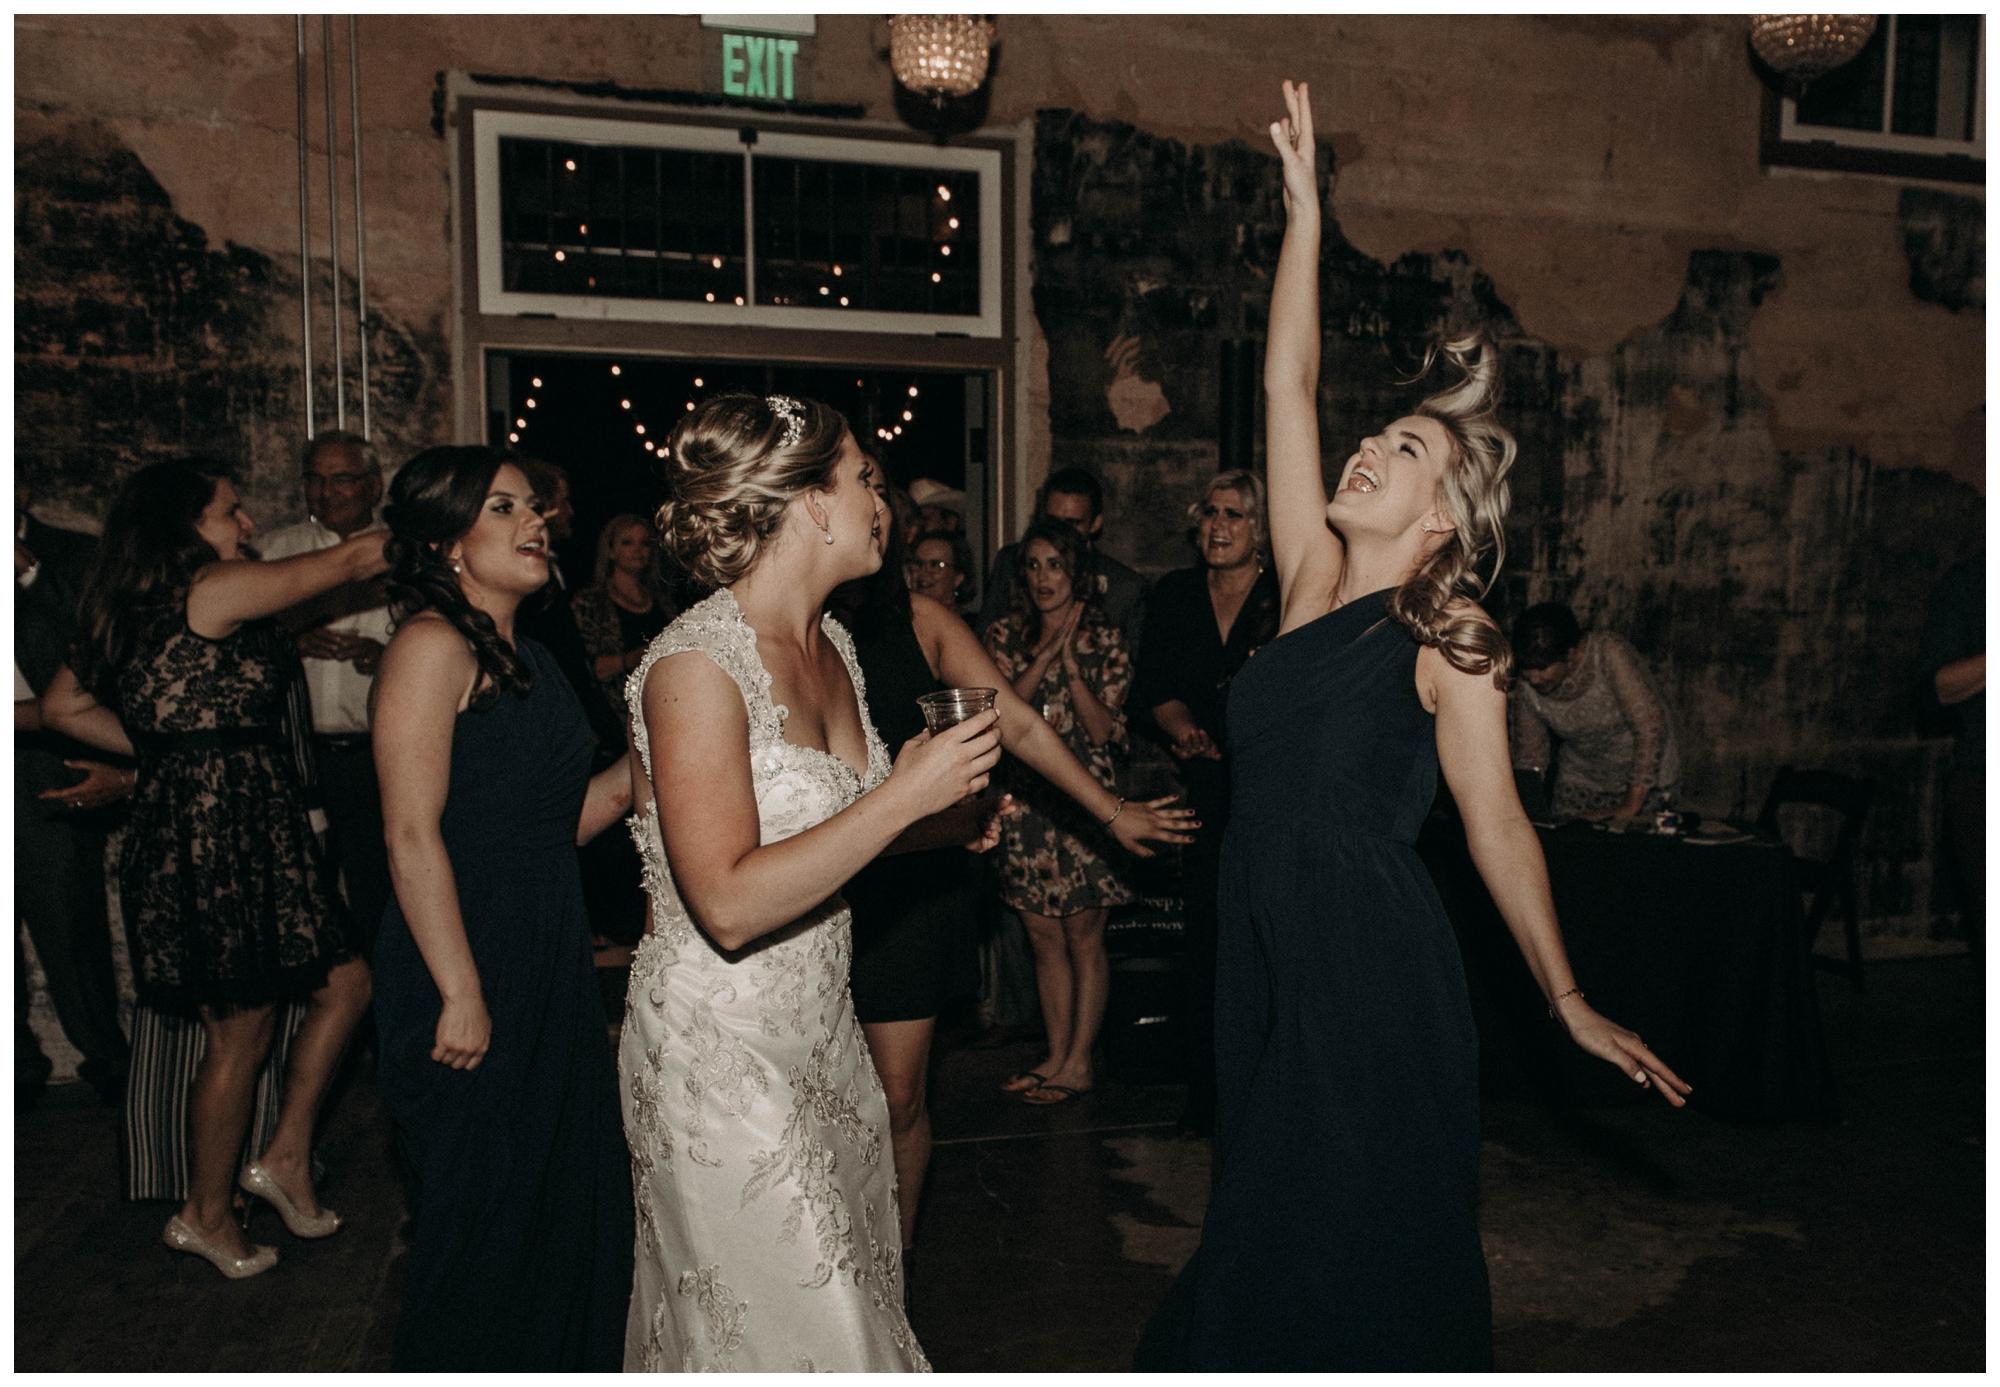 austin-texas-wedding-photography-1778-photographie_0134.jpg